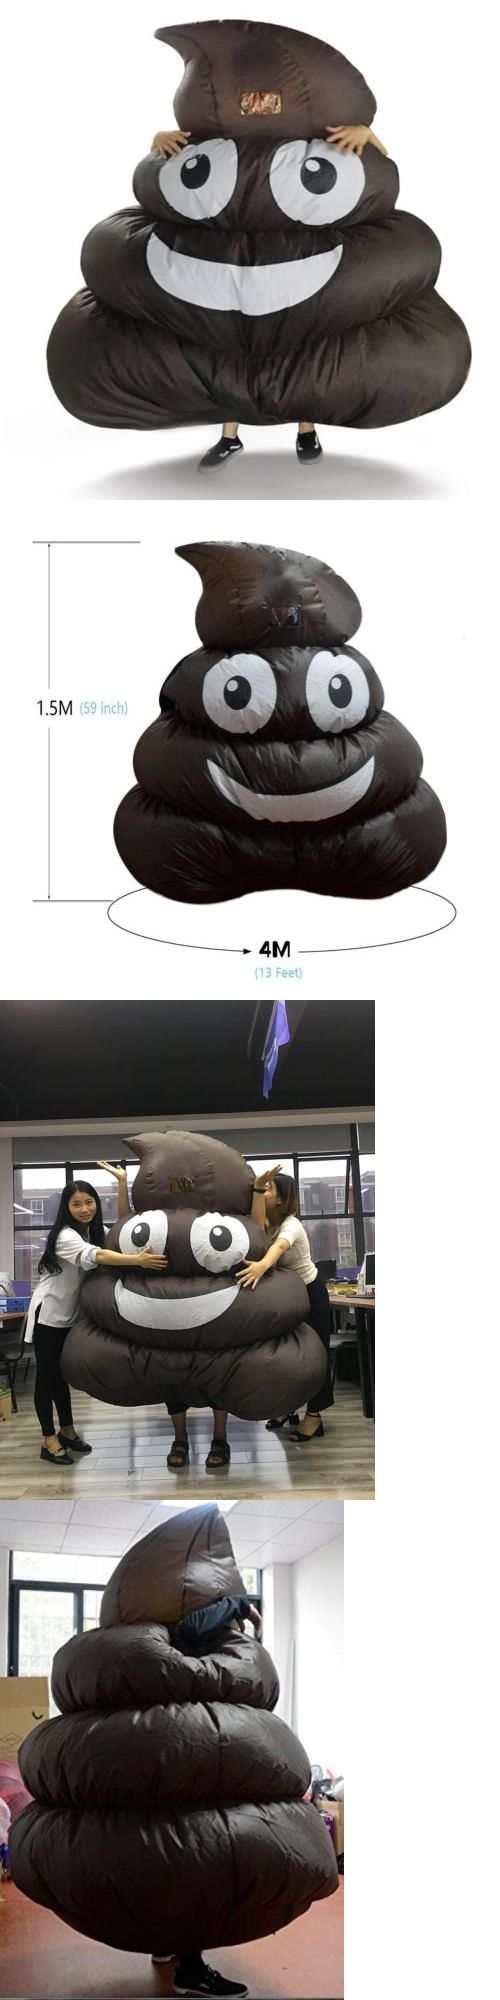 Best 25+ Emoji costume ideas on Pinterest | Emoji halloween ...